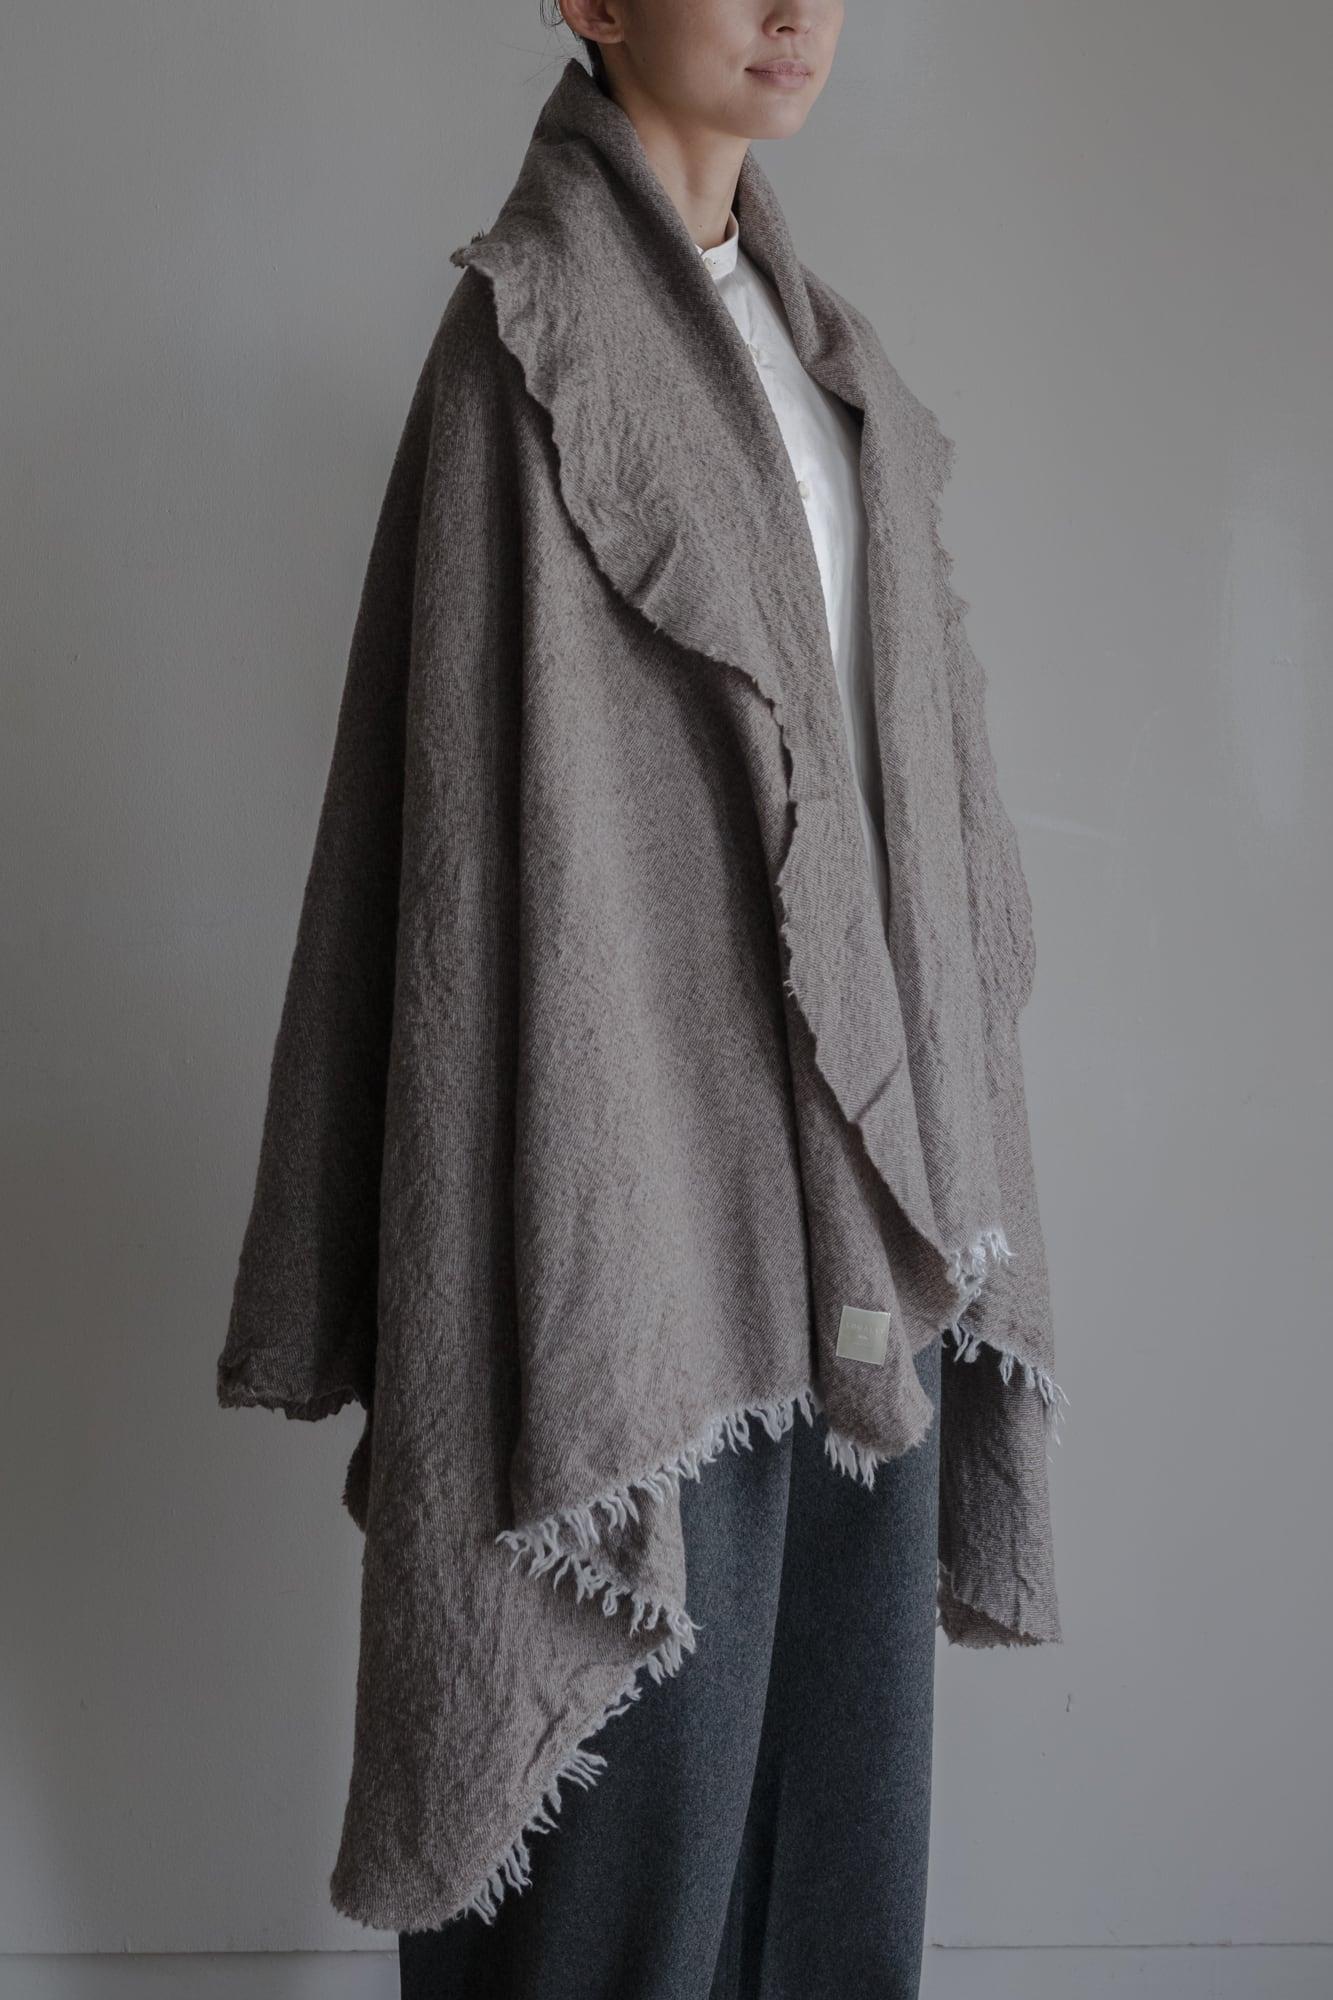 01602-2 chambray cut stole / lightgray,brown